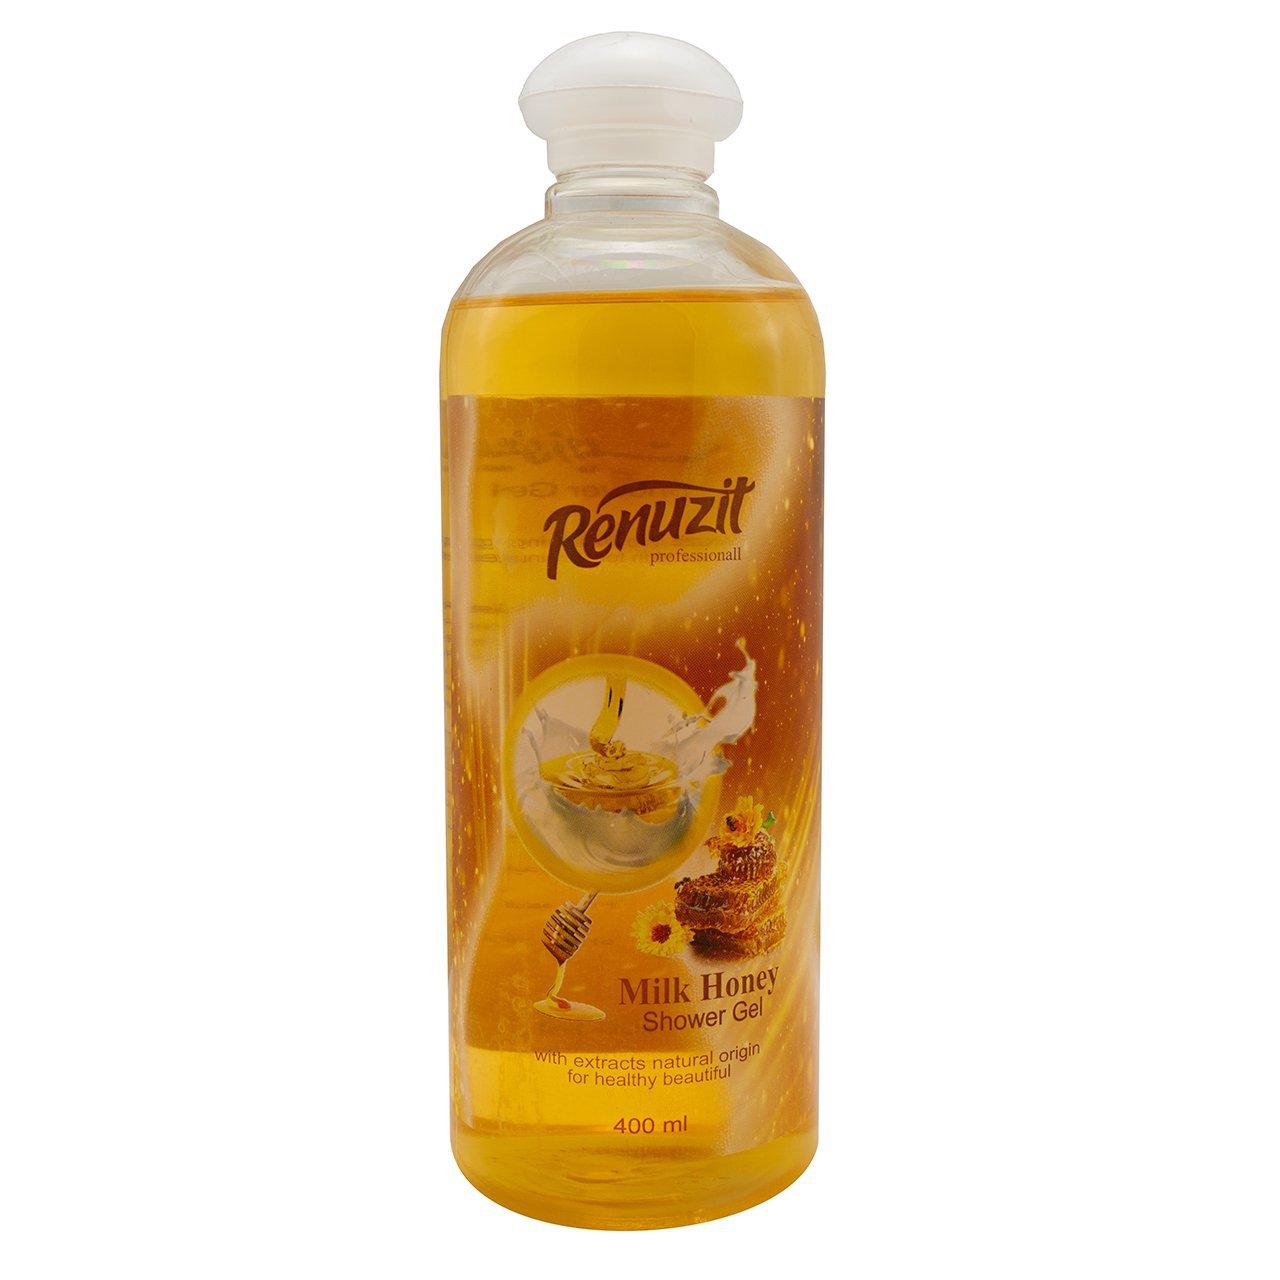 ژل شستشو رینو زیت مدل Milk Honey حجم 400 میلی لیتر